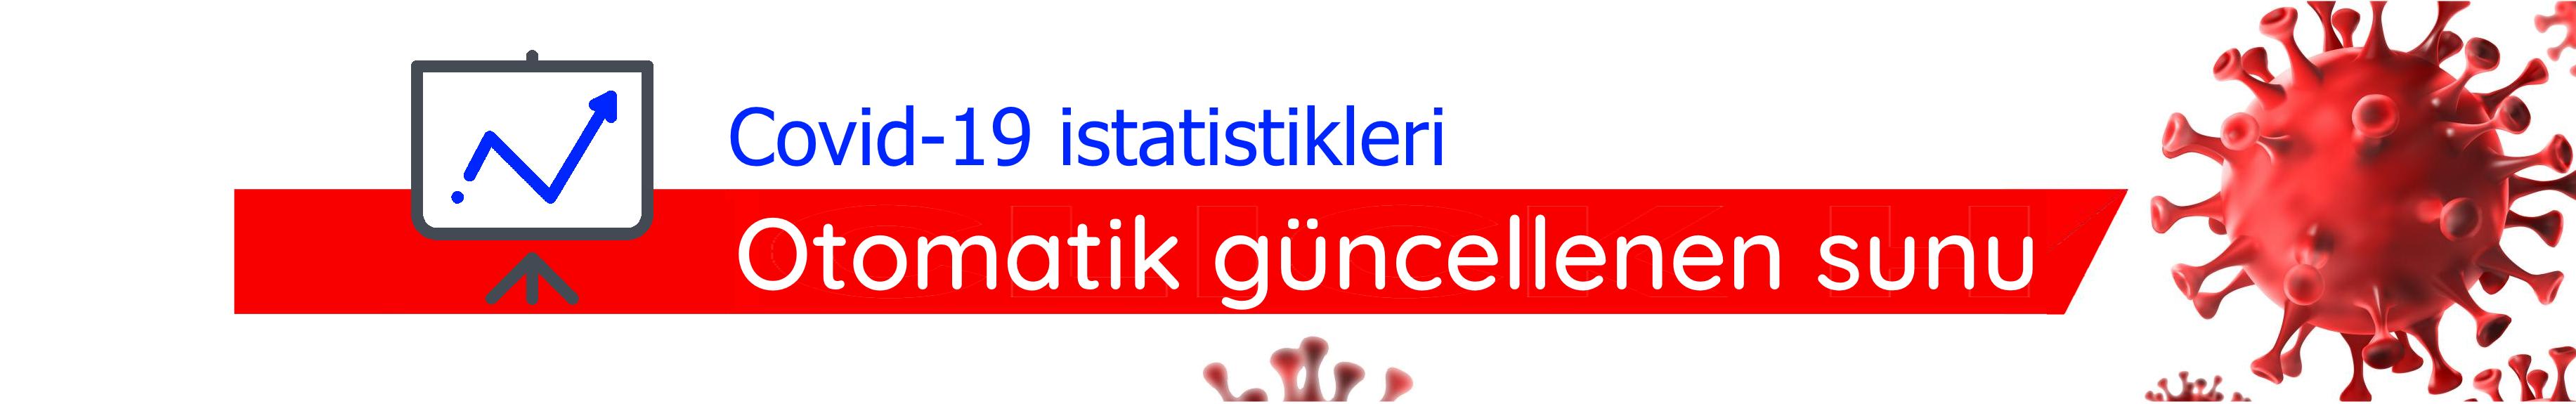 covid19 banner (2)